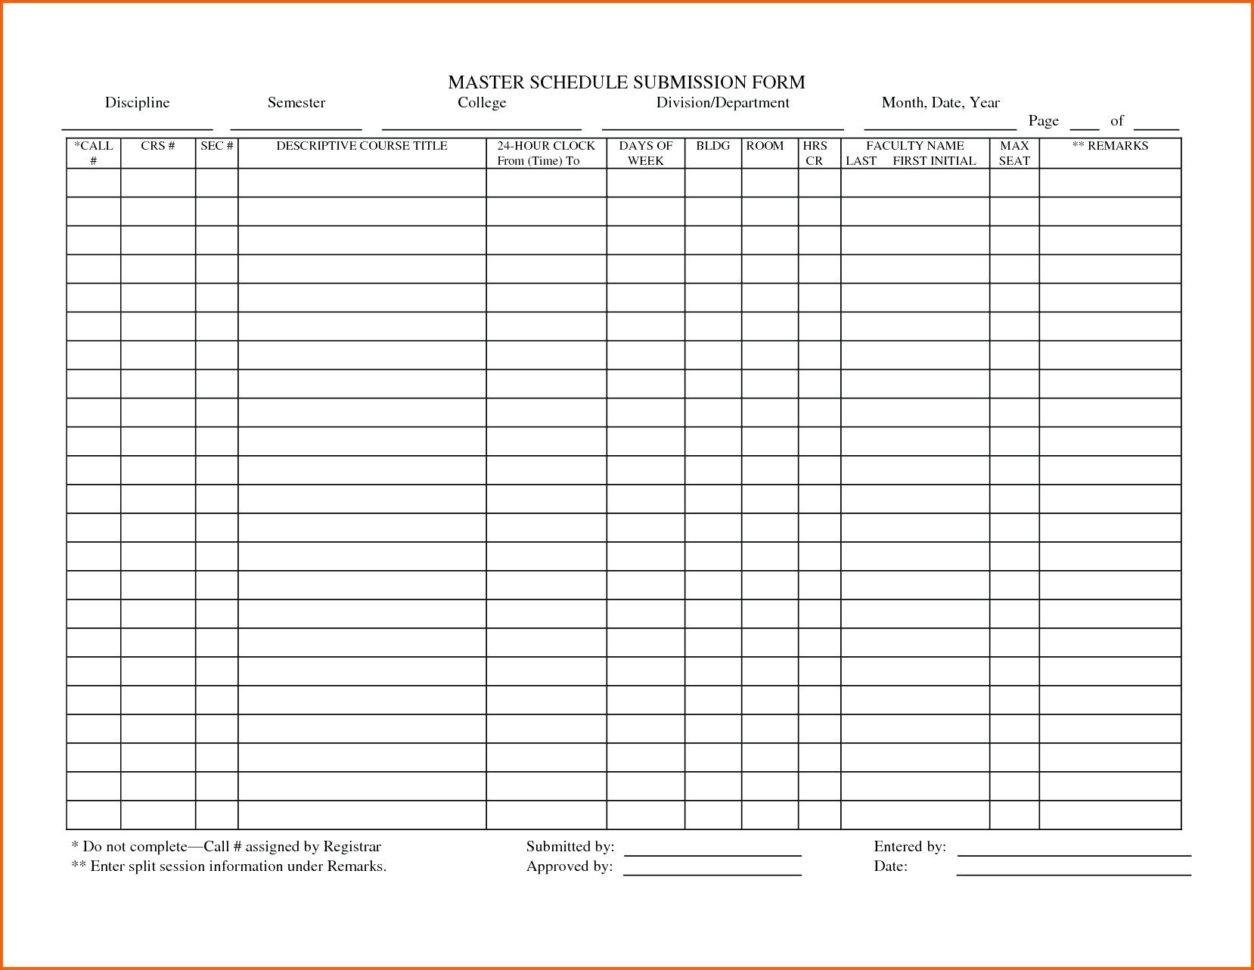 Time Clock Spreadsheet Free Download In Time Clock Spreadsheet Template Calculator Free Download Sheet